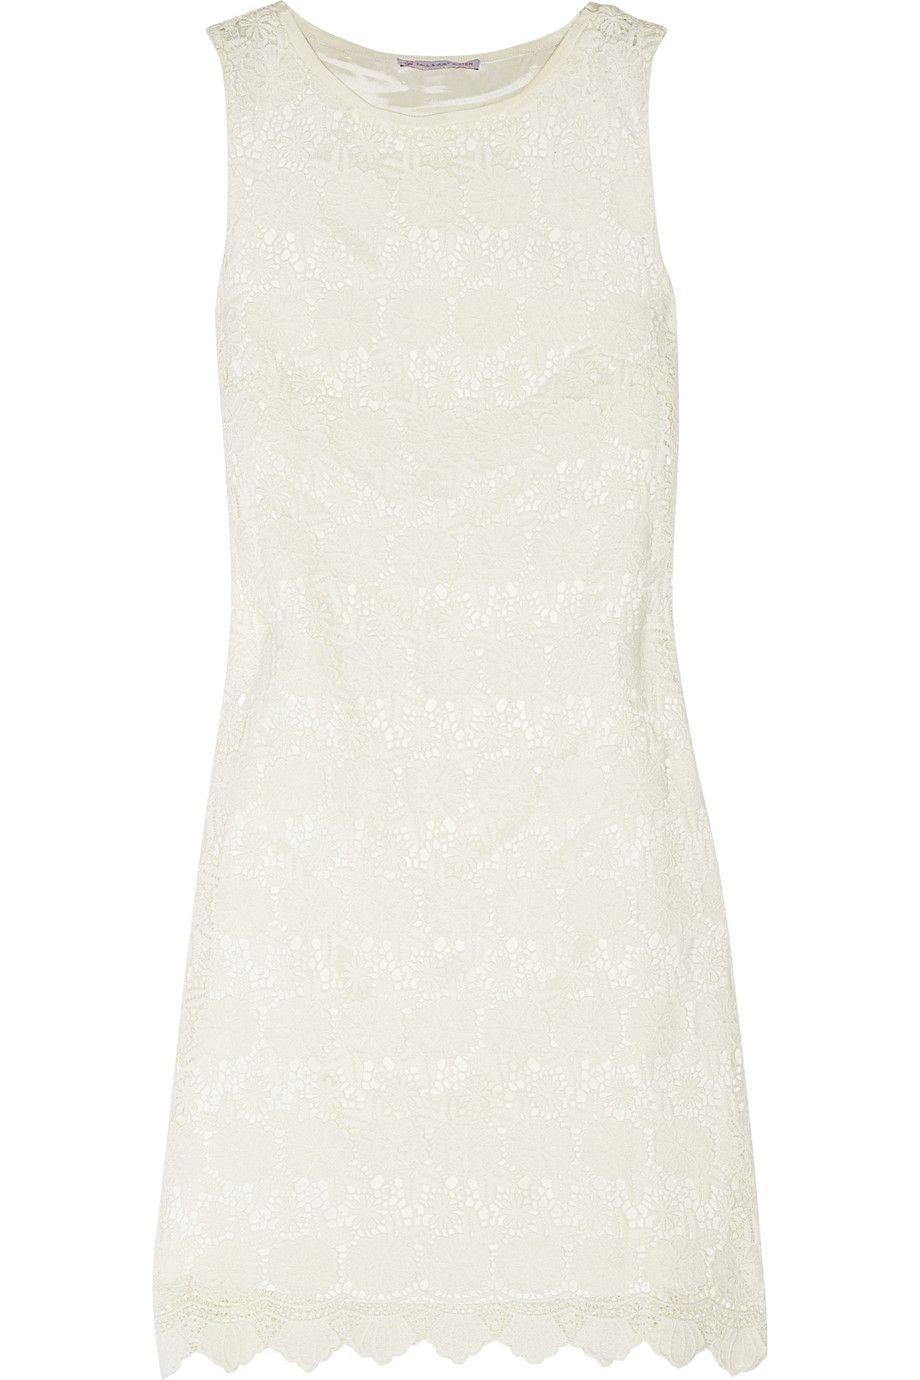 Paul u joe sister cottonlace mini dress wedding reception dress